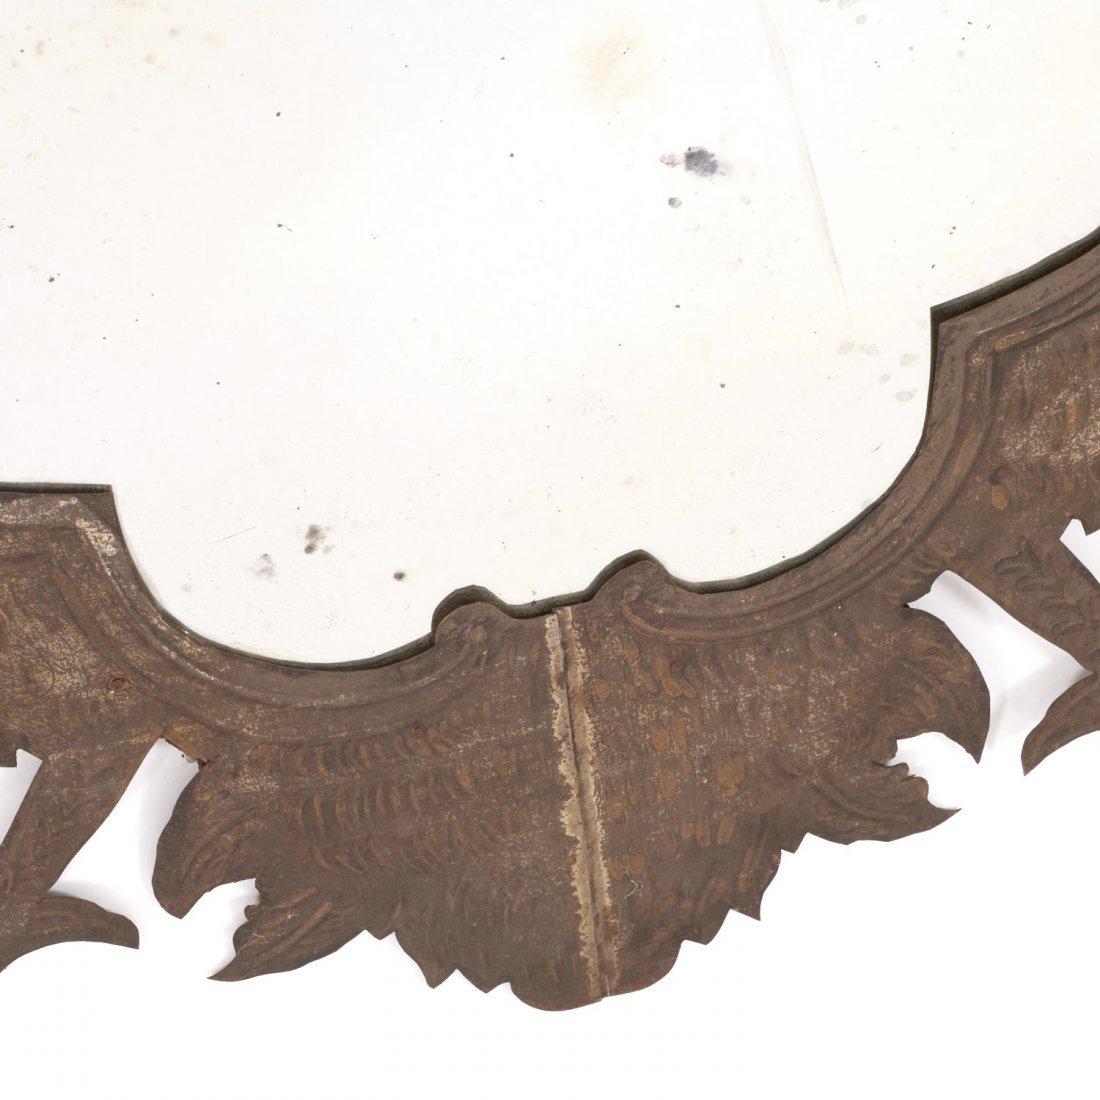 Pr Spanish Colonial style gilt metal wall mirrors - 6